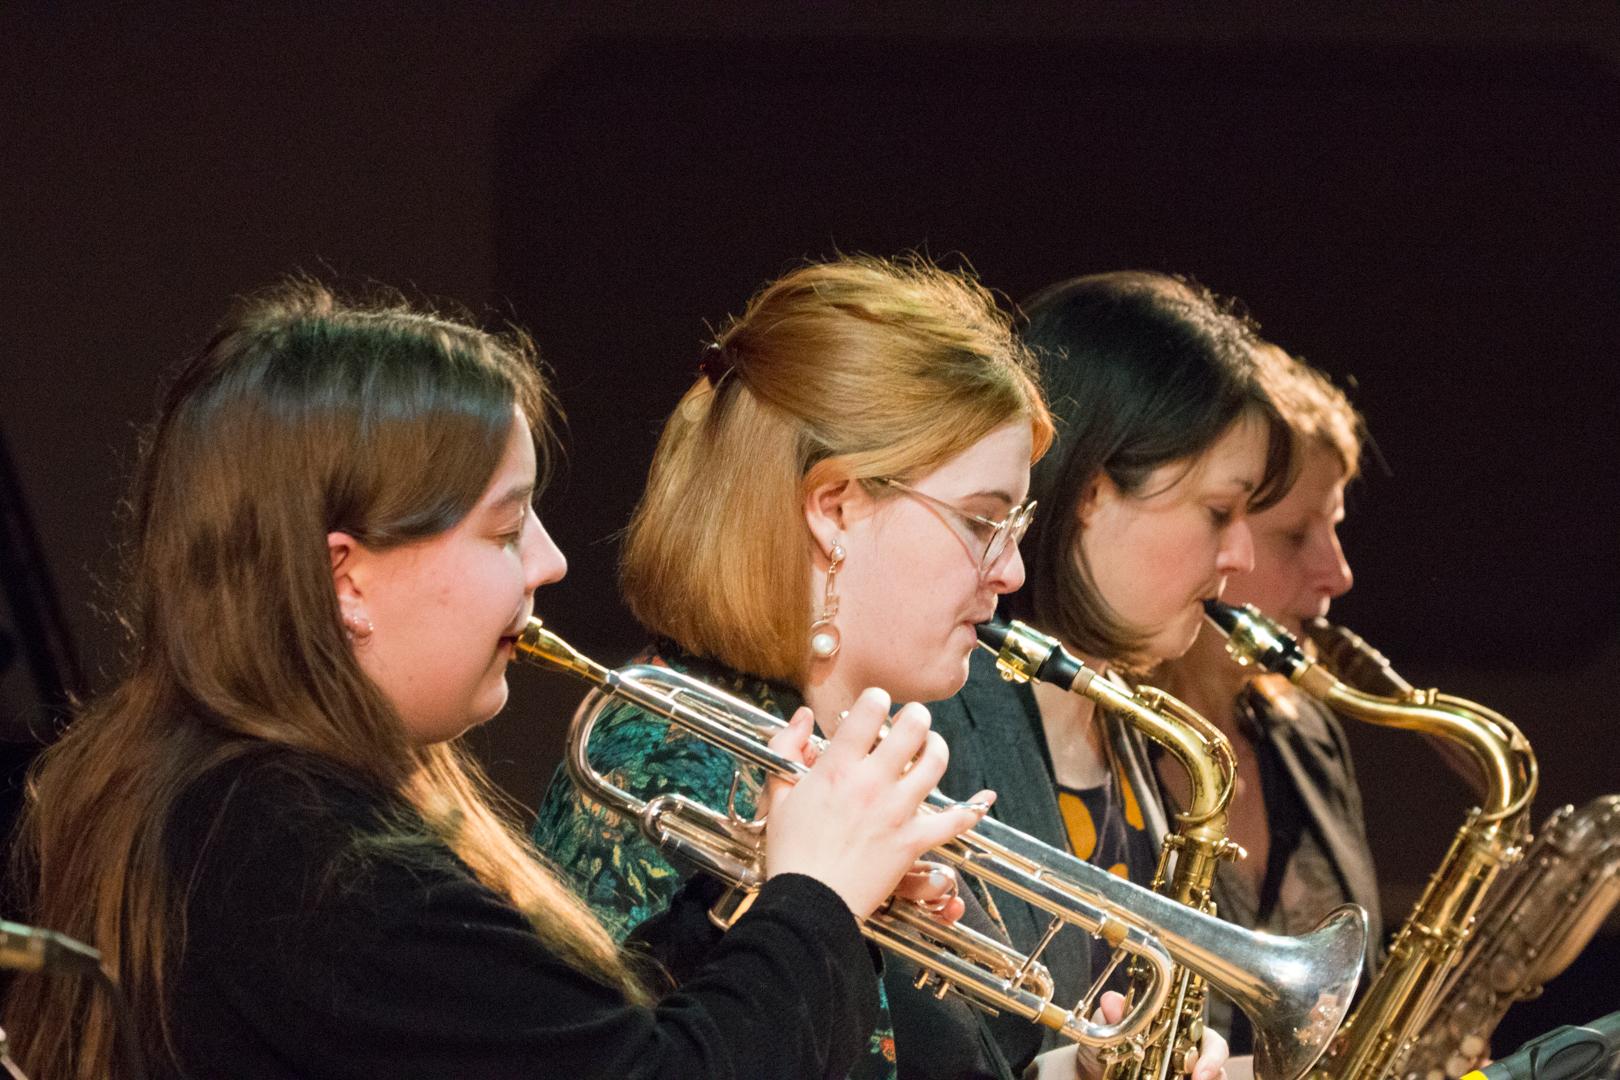 Alex Ridout, Alice Leggett, Trish Clowes and Karen Sharp performing in the Nikki Iles All Star Septet at Fleet Jazz on 19th Feb 2019.